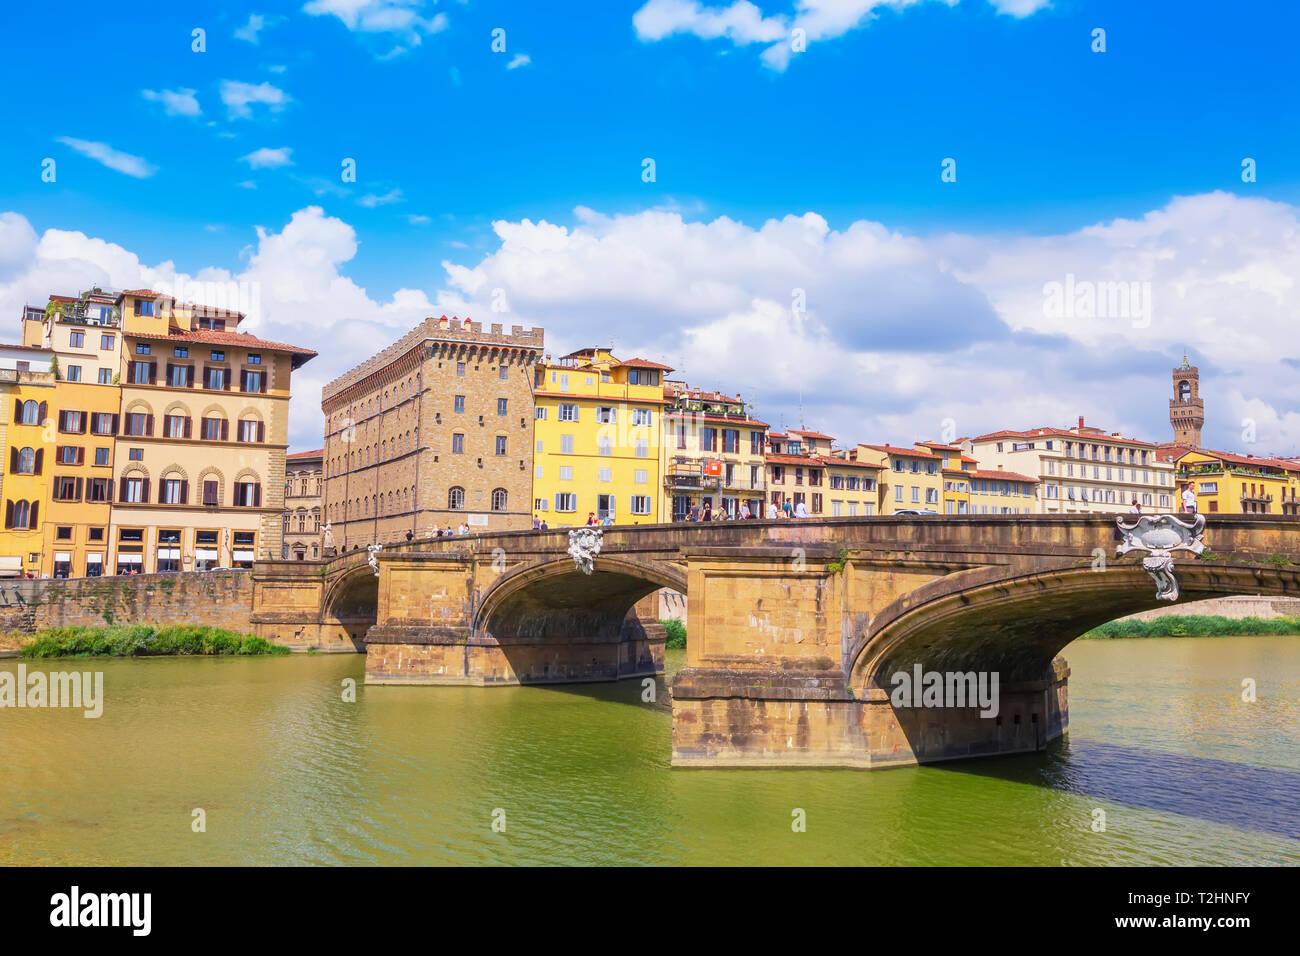 Santa Trinita Bridge spanning the River Arno, Florence, Tuscany, Italy, Europe - Stock Image